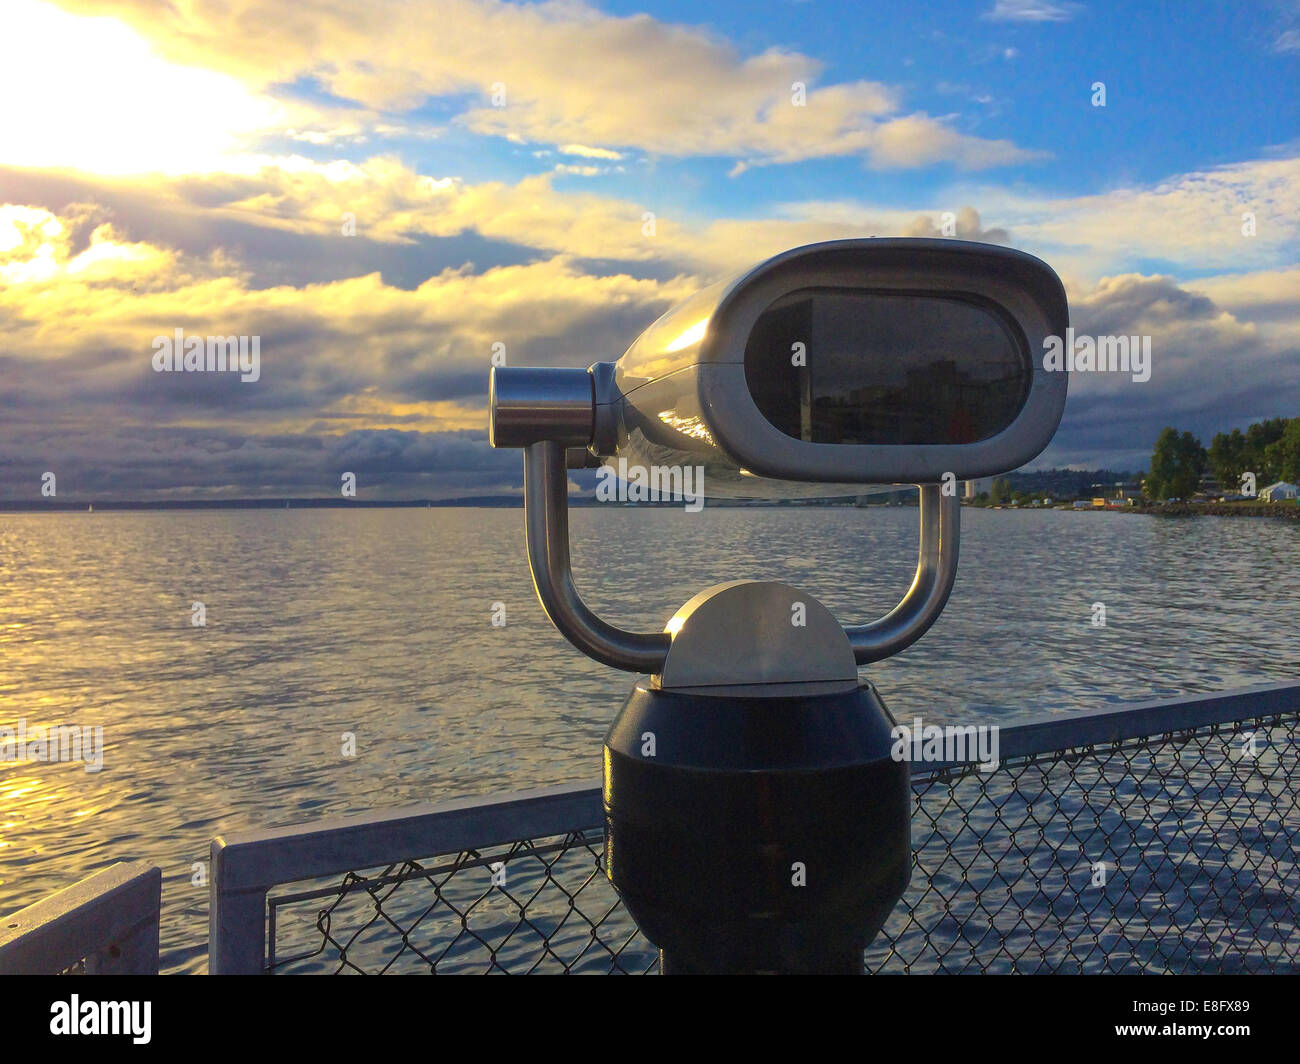 USA, Washington State, Snohomish County, Edmonds, Admiral Way, Puget Sound sunset at Pier 70 - Stock Image